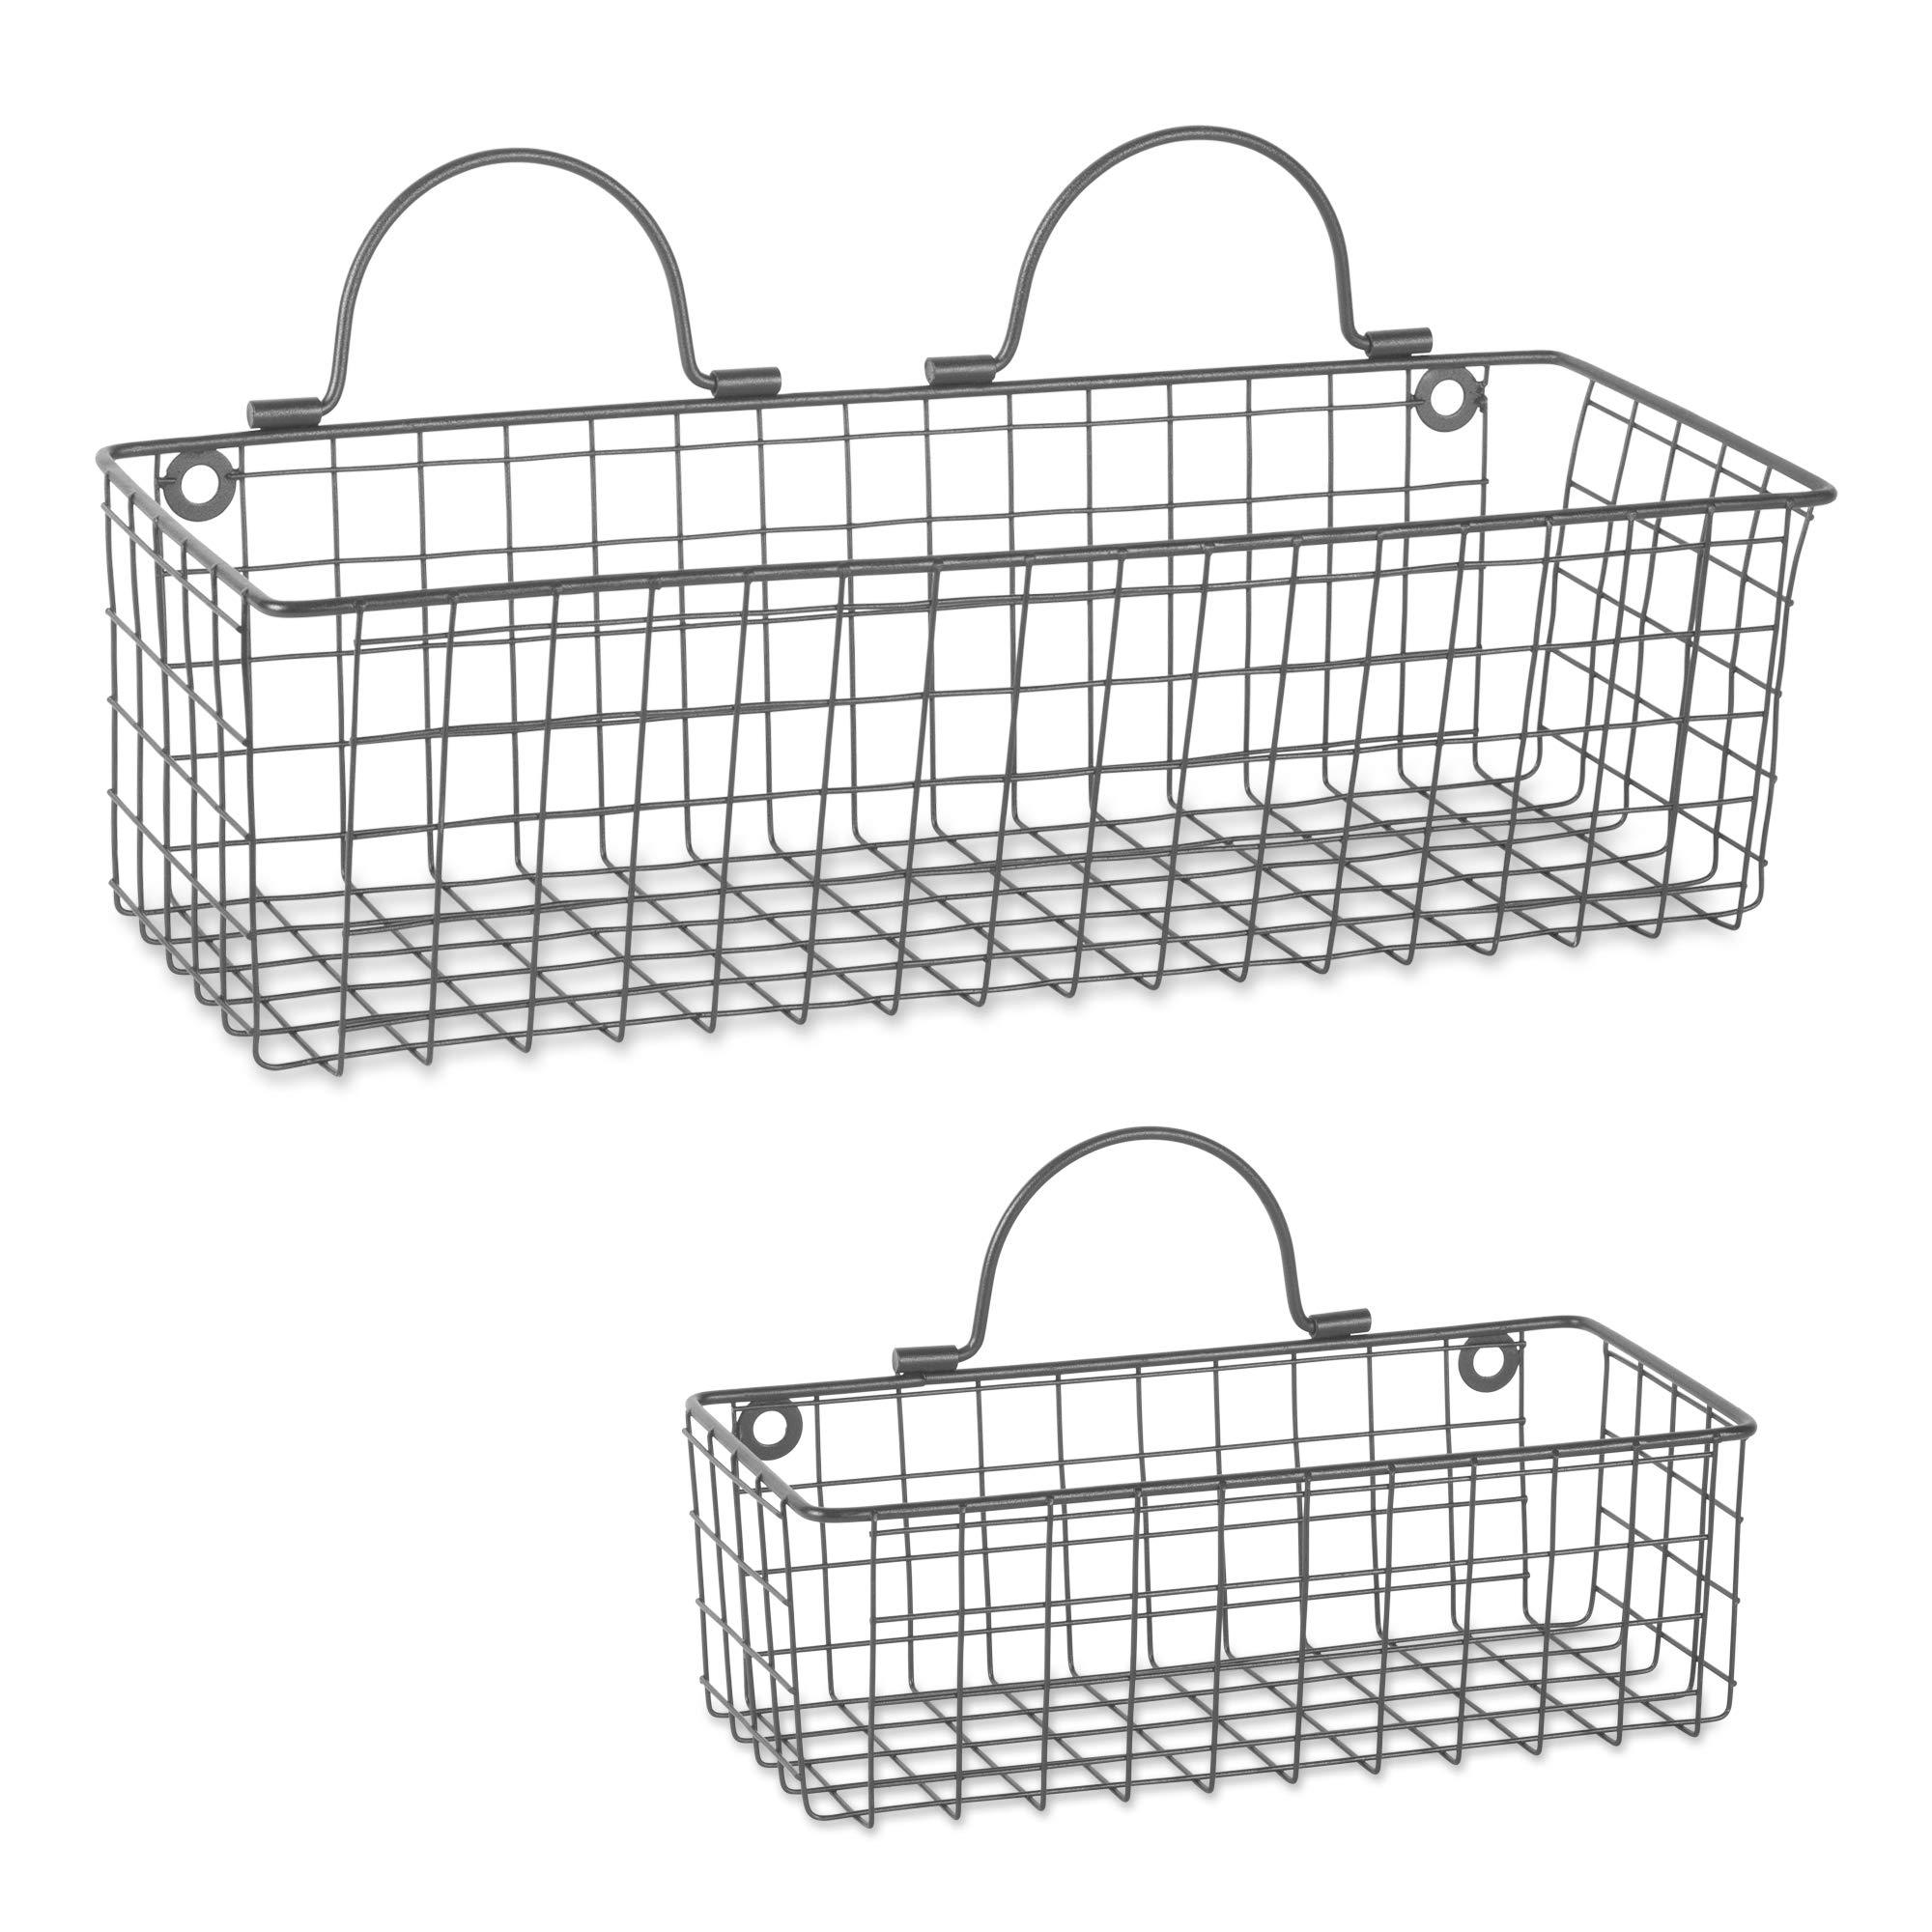 hanging baskets for bathroom amazon com rh amazon com  hanging baskets for bathroom storage